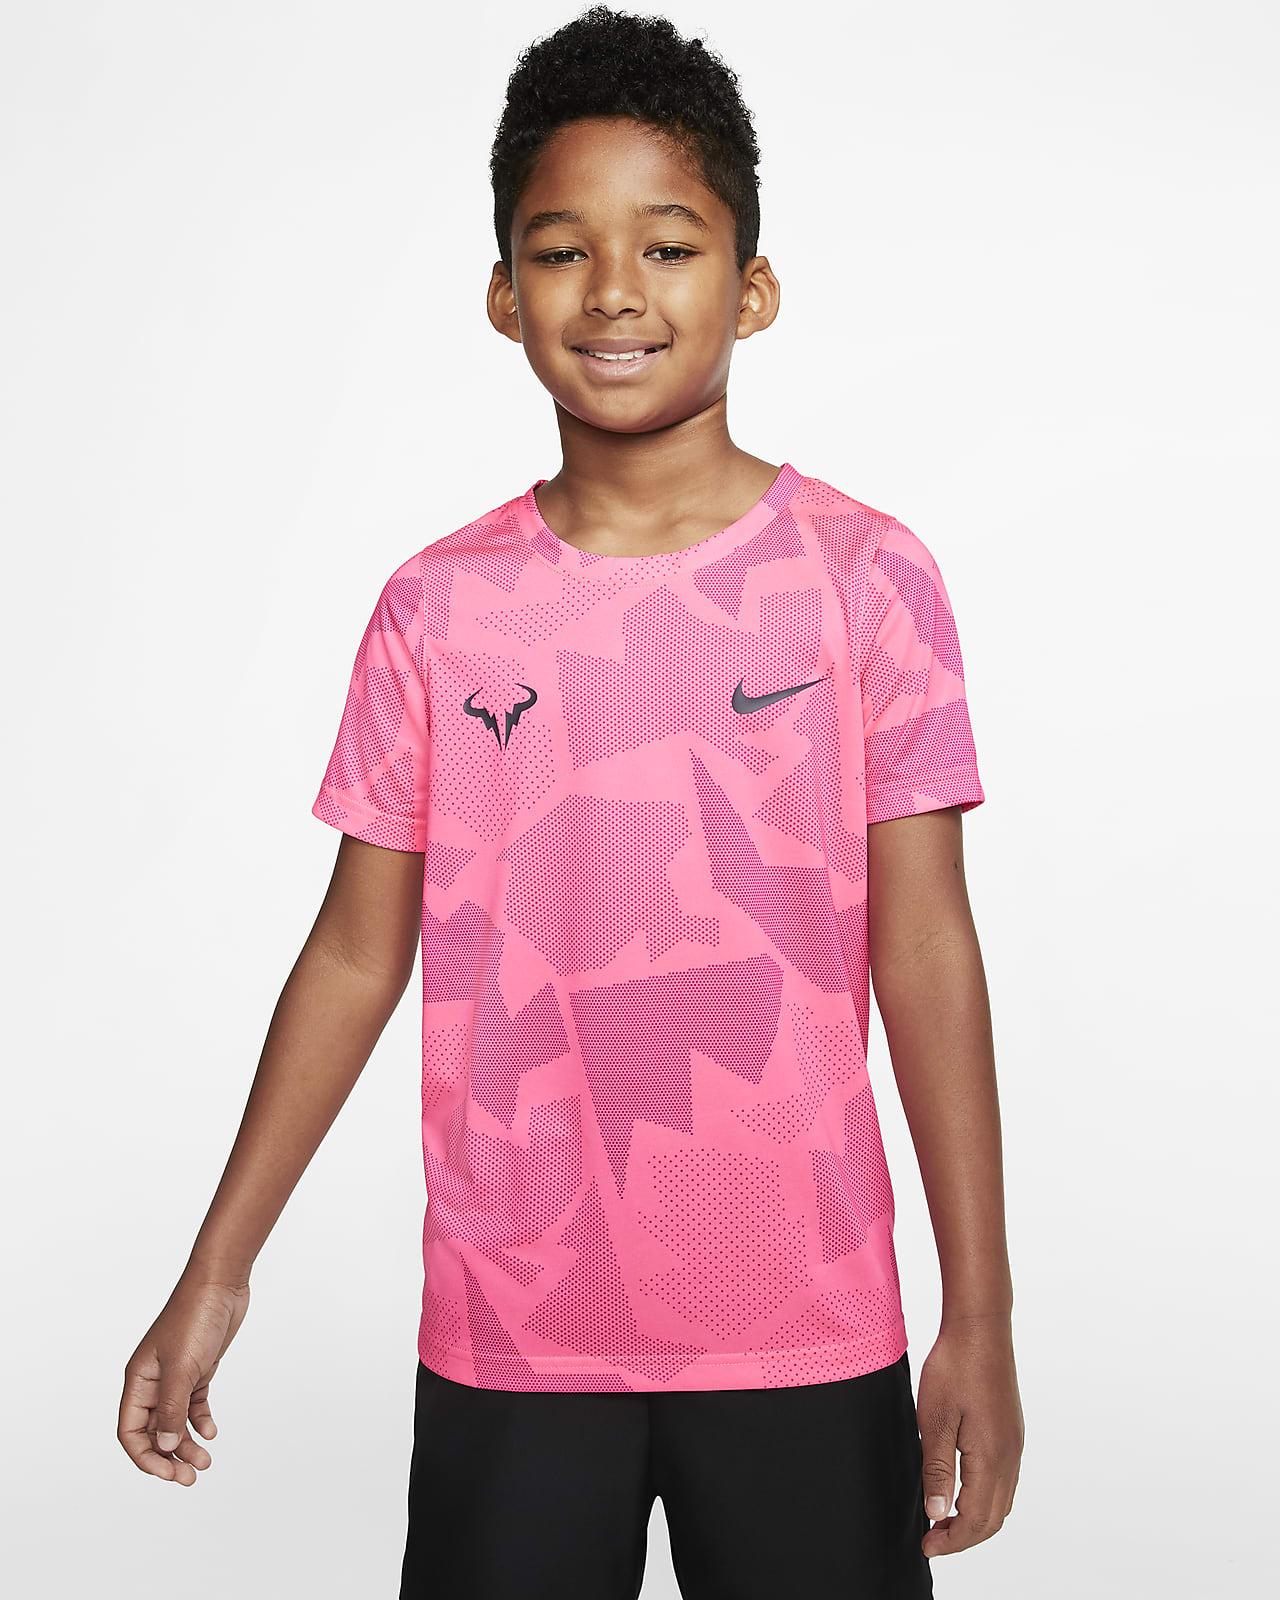 Tee shirt de tennis NikeCourt Dri FIT Rafa pour Garçon plus âgé